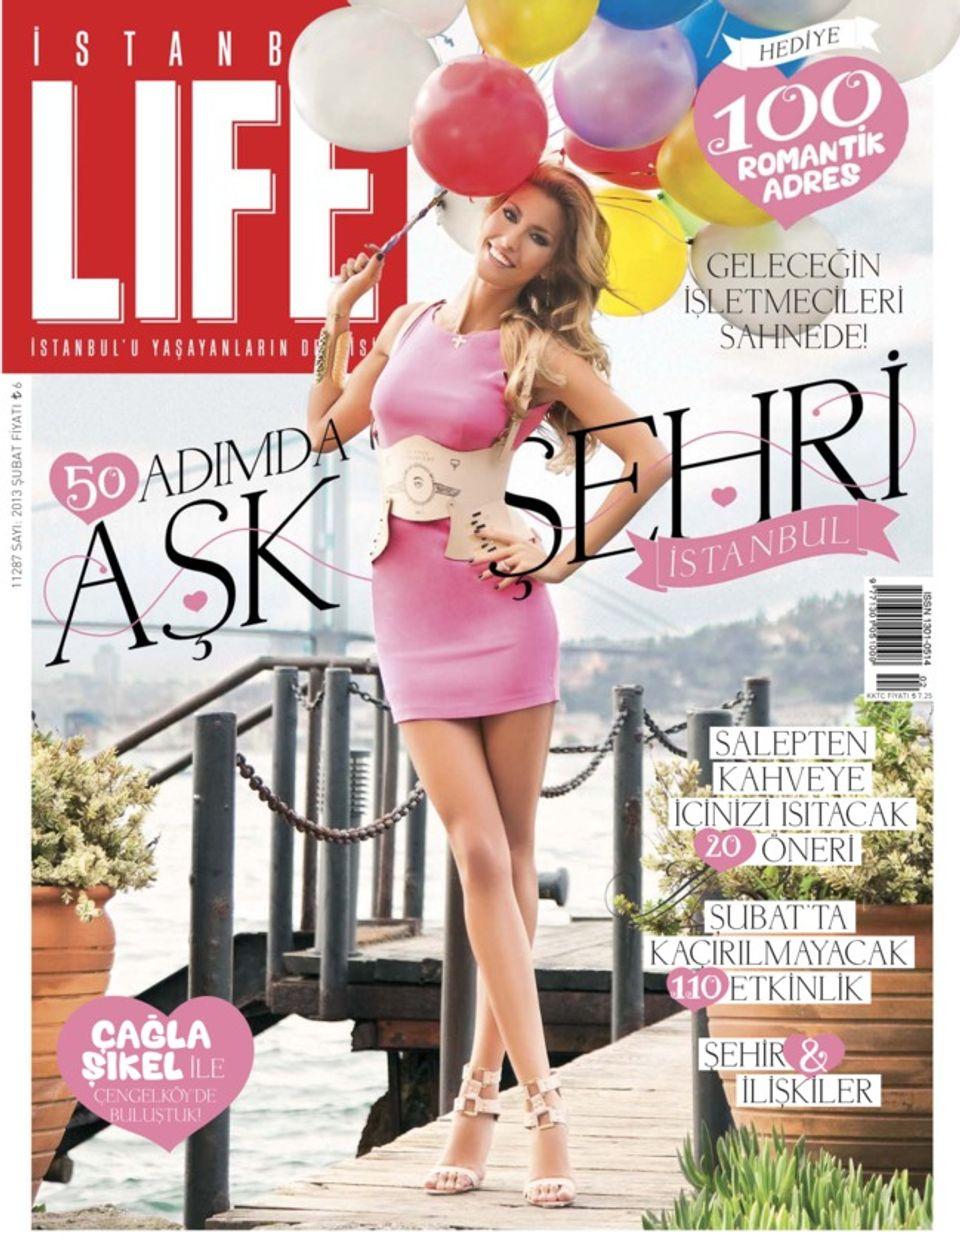 Istanbul Life-February 2013 Magazine - Get your Digital